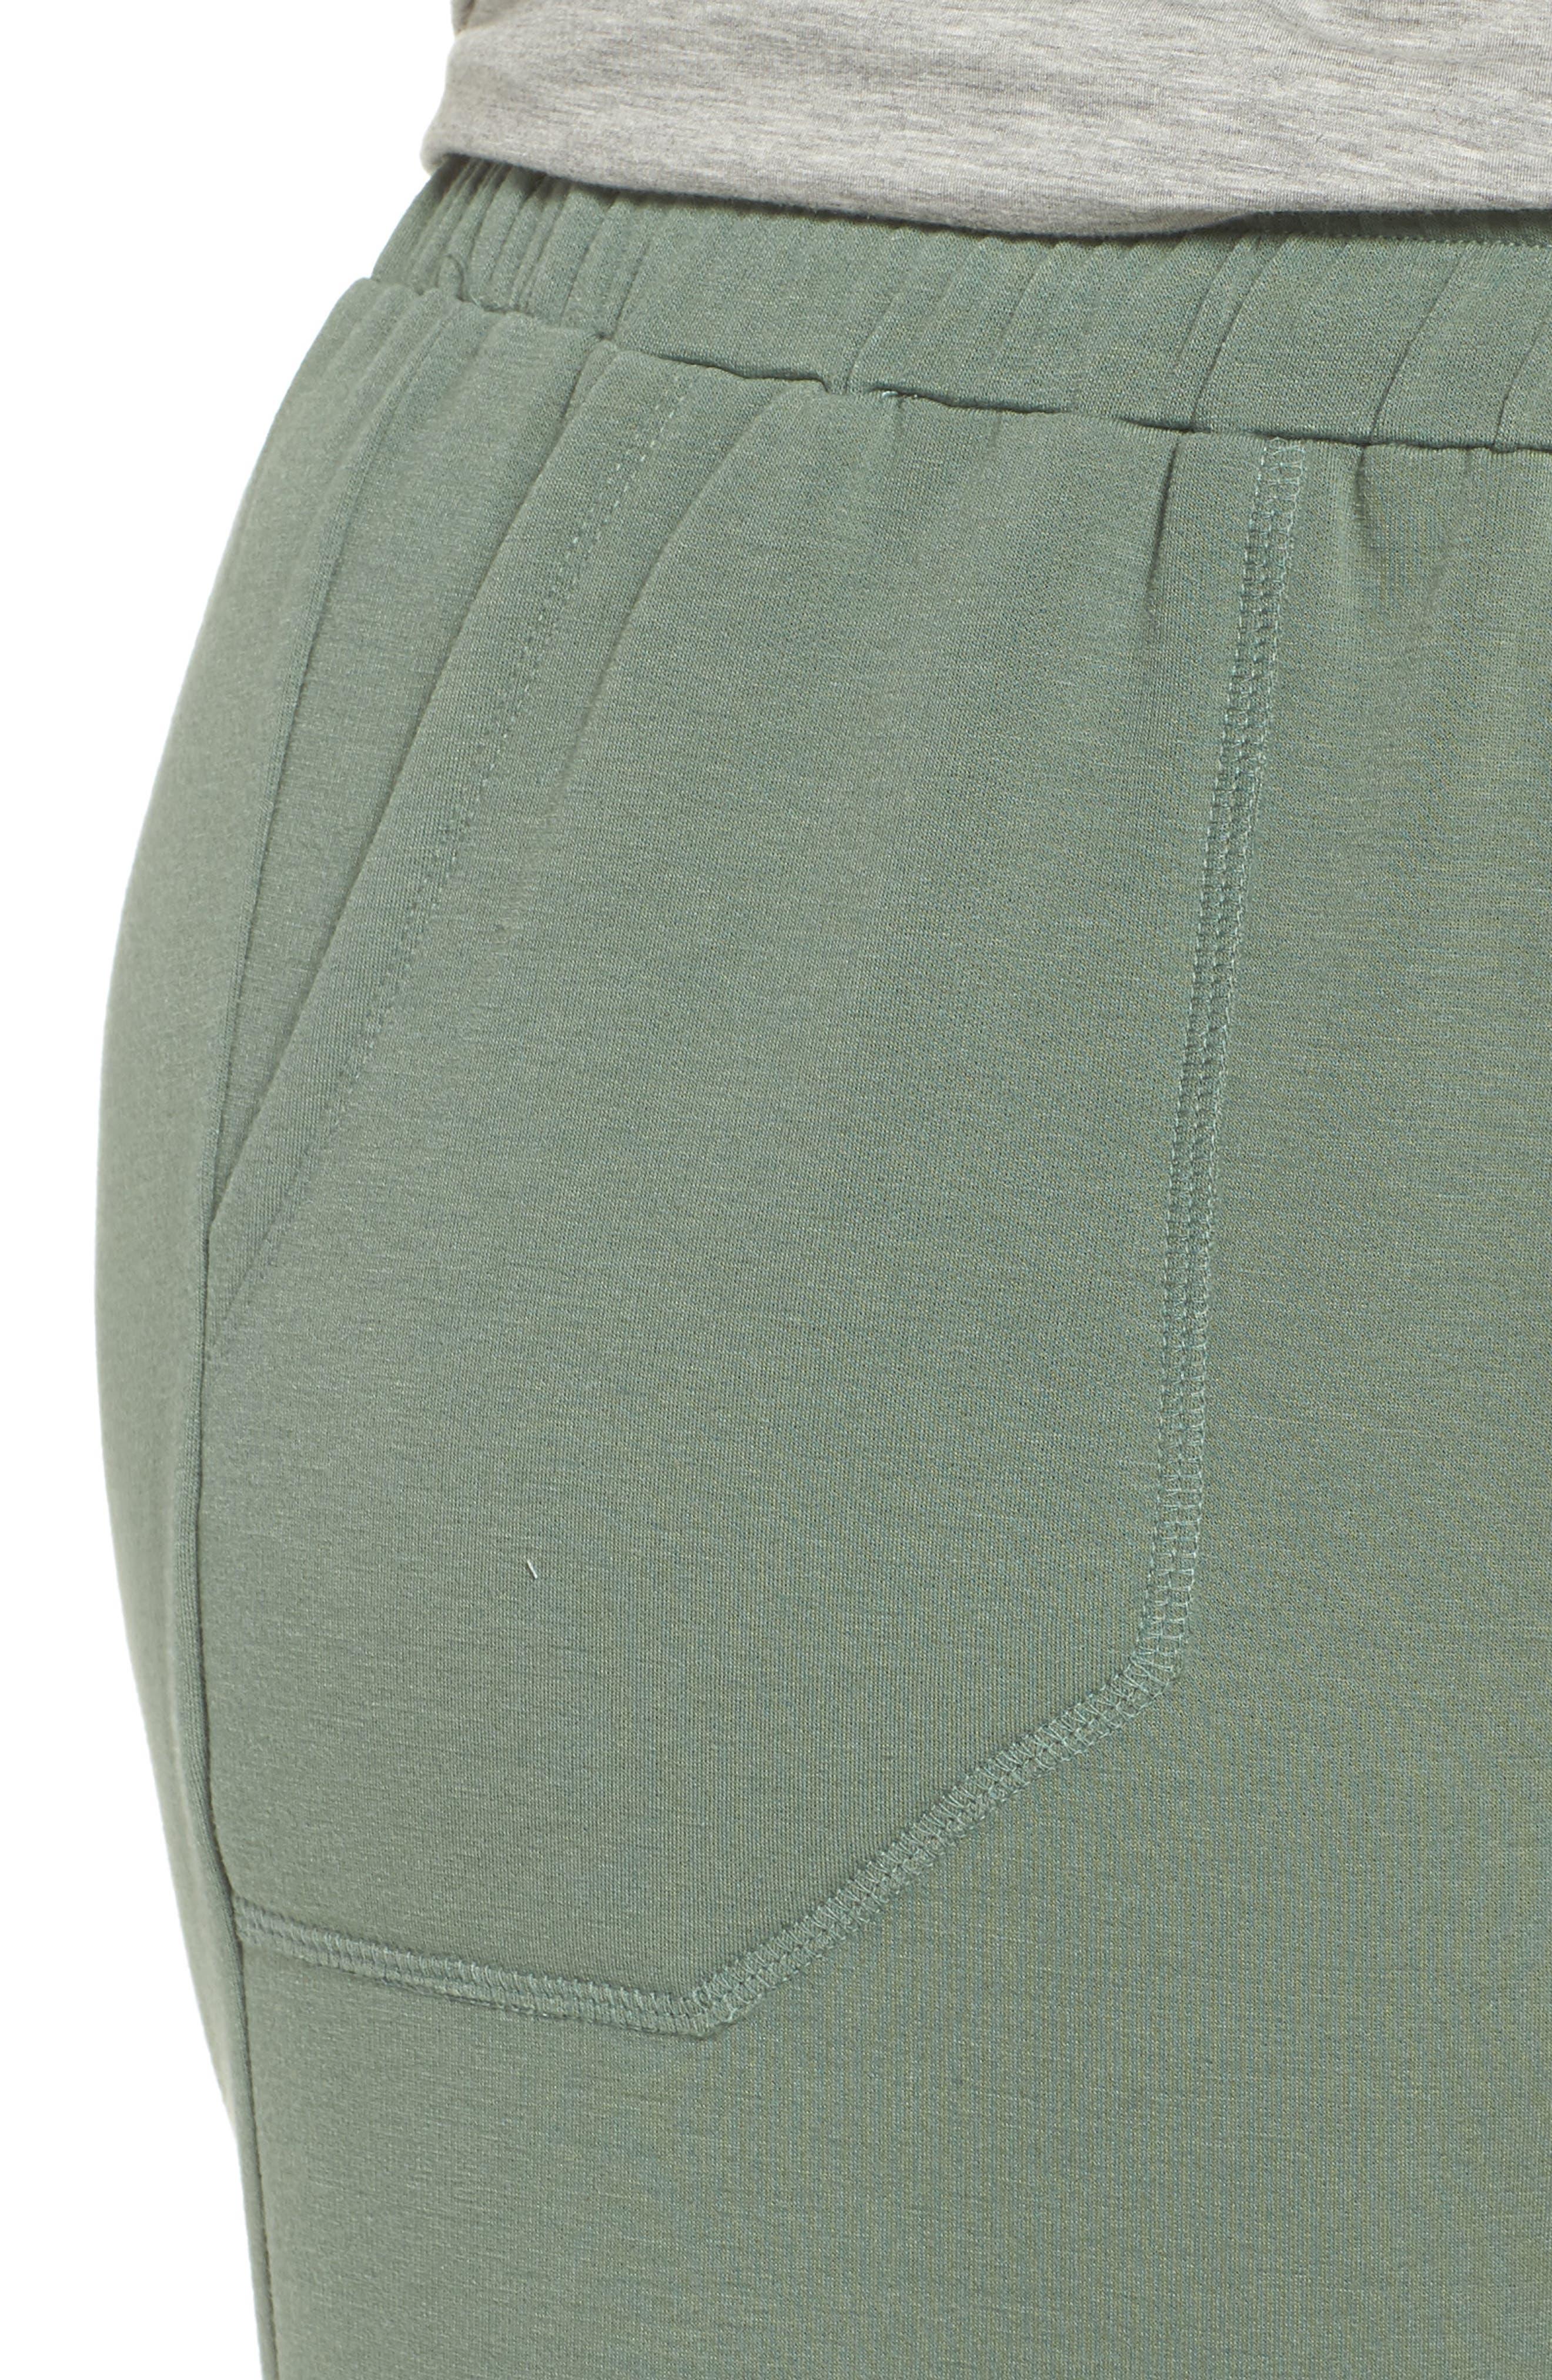 Off Duty Easy Drawstring Pants,                             Alternate thumbnail 9, color,